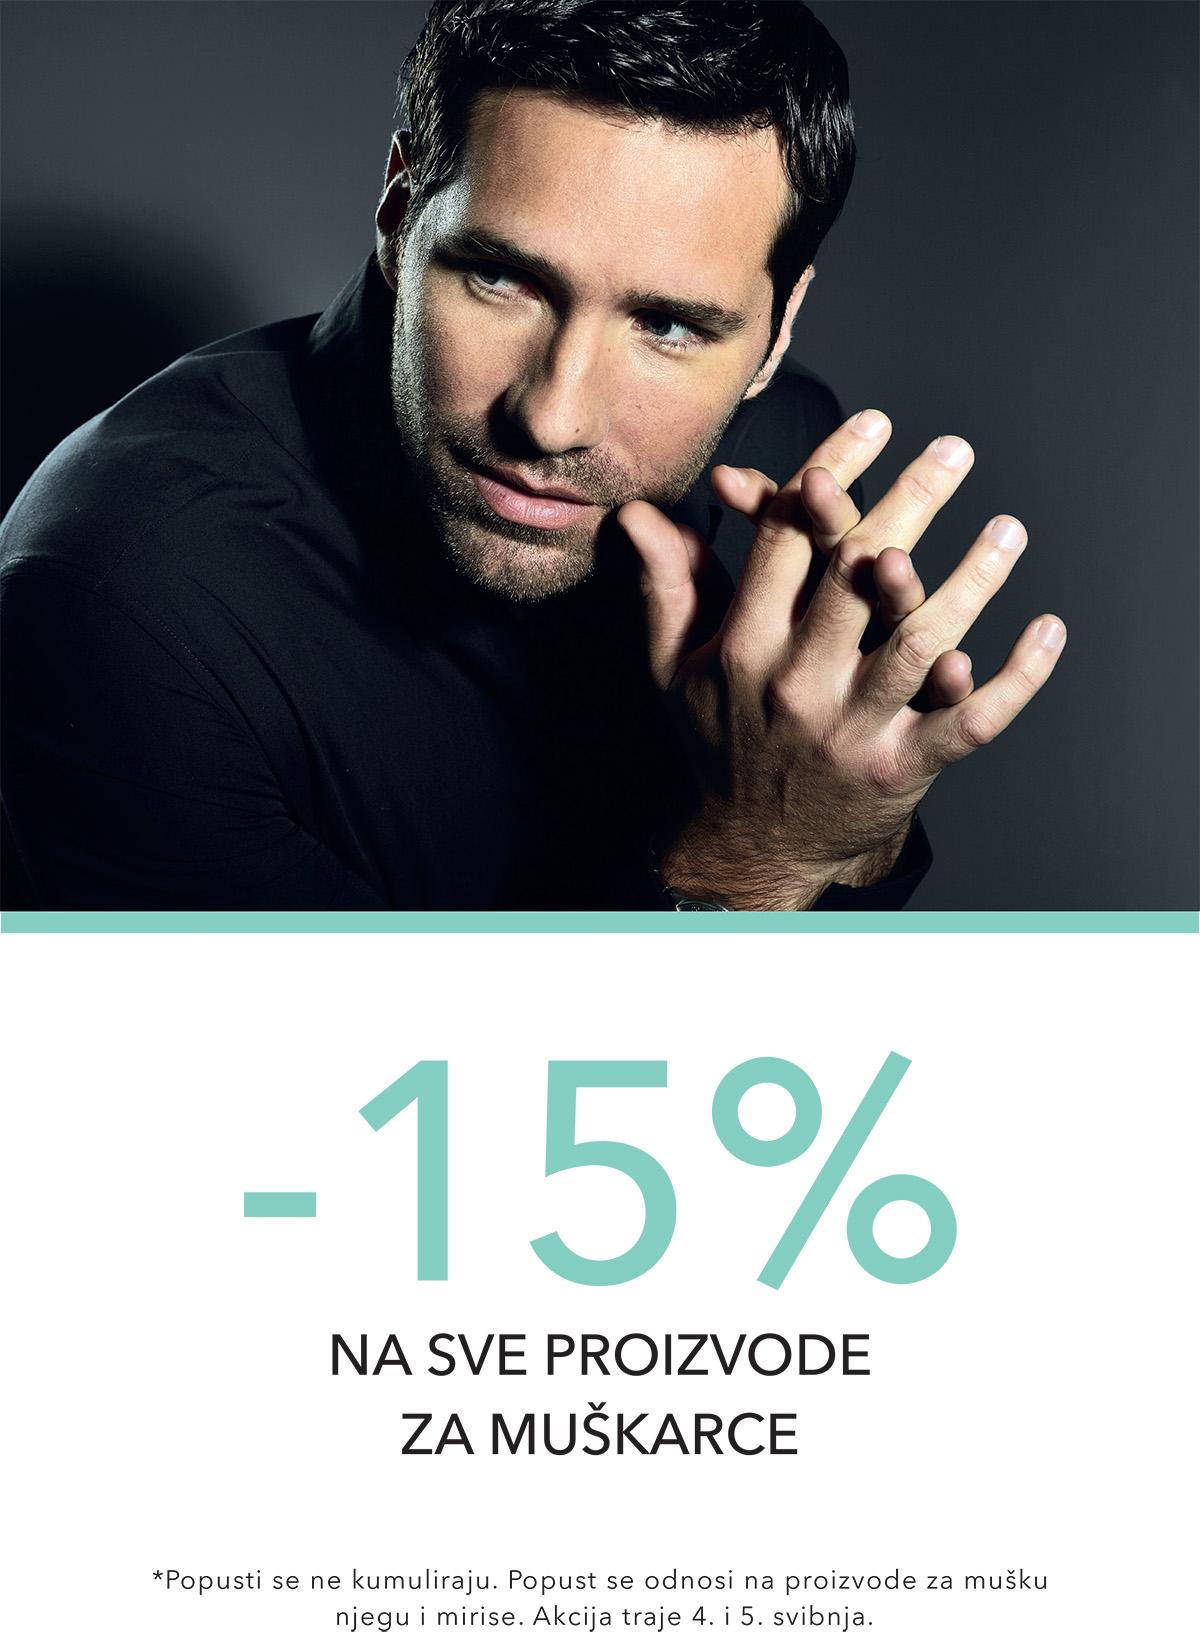 MuškaNjega_15%.indd